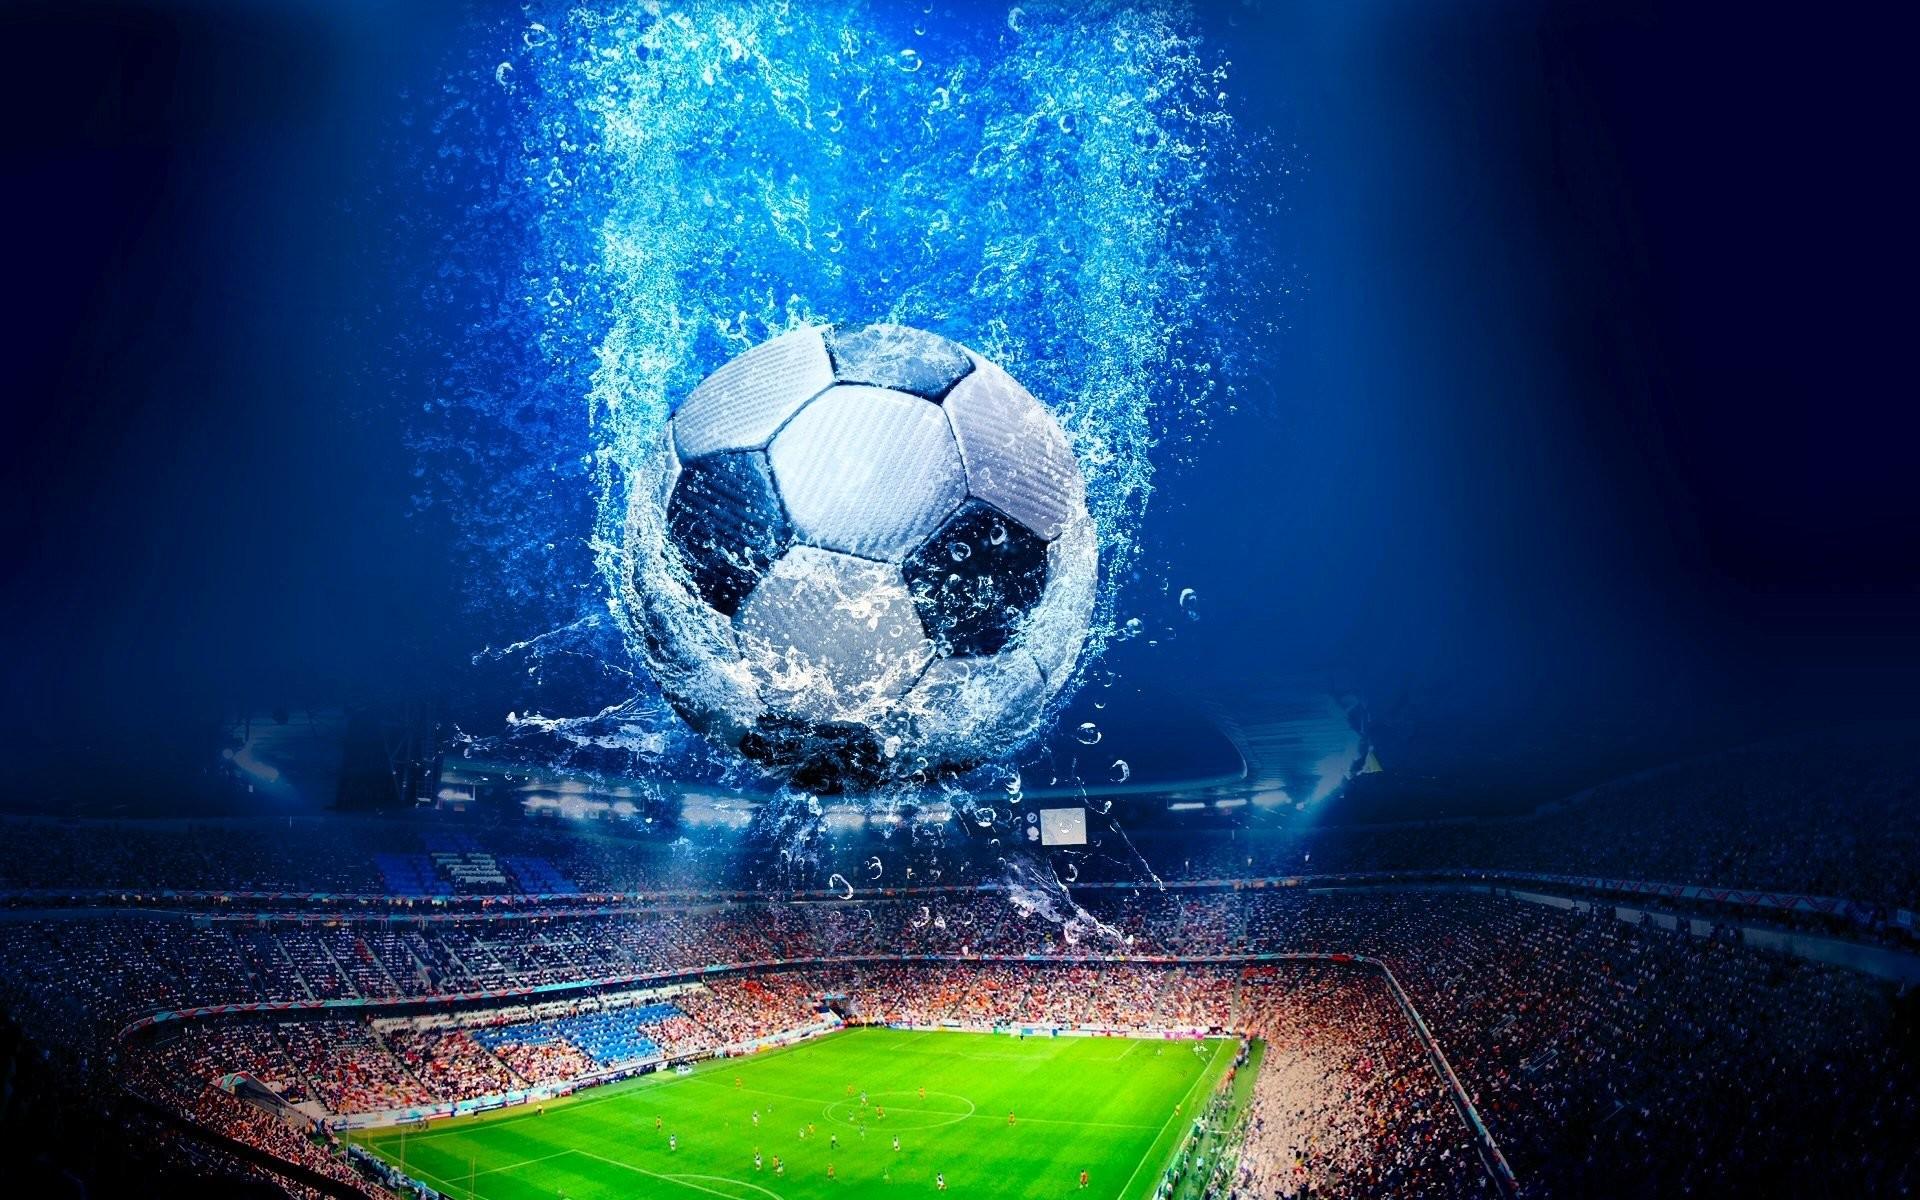 hd soccer stadium wallpaper 65 images